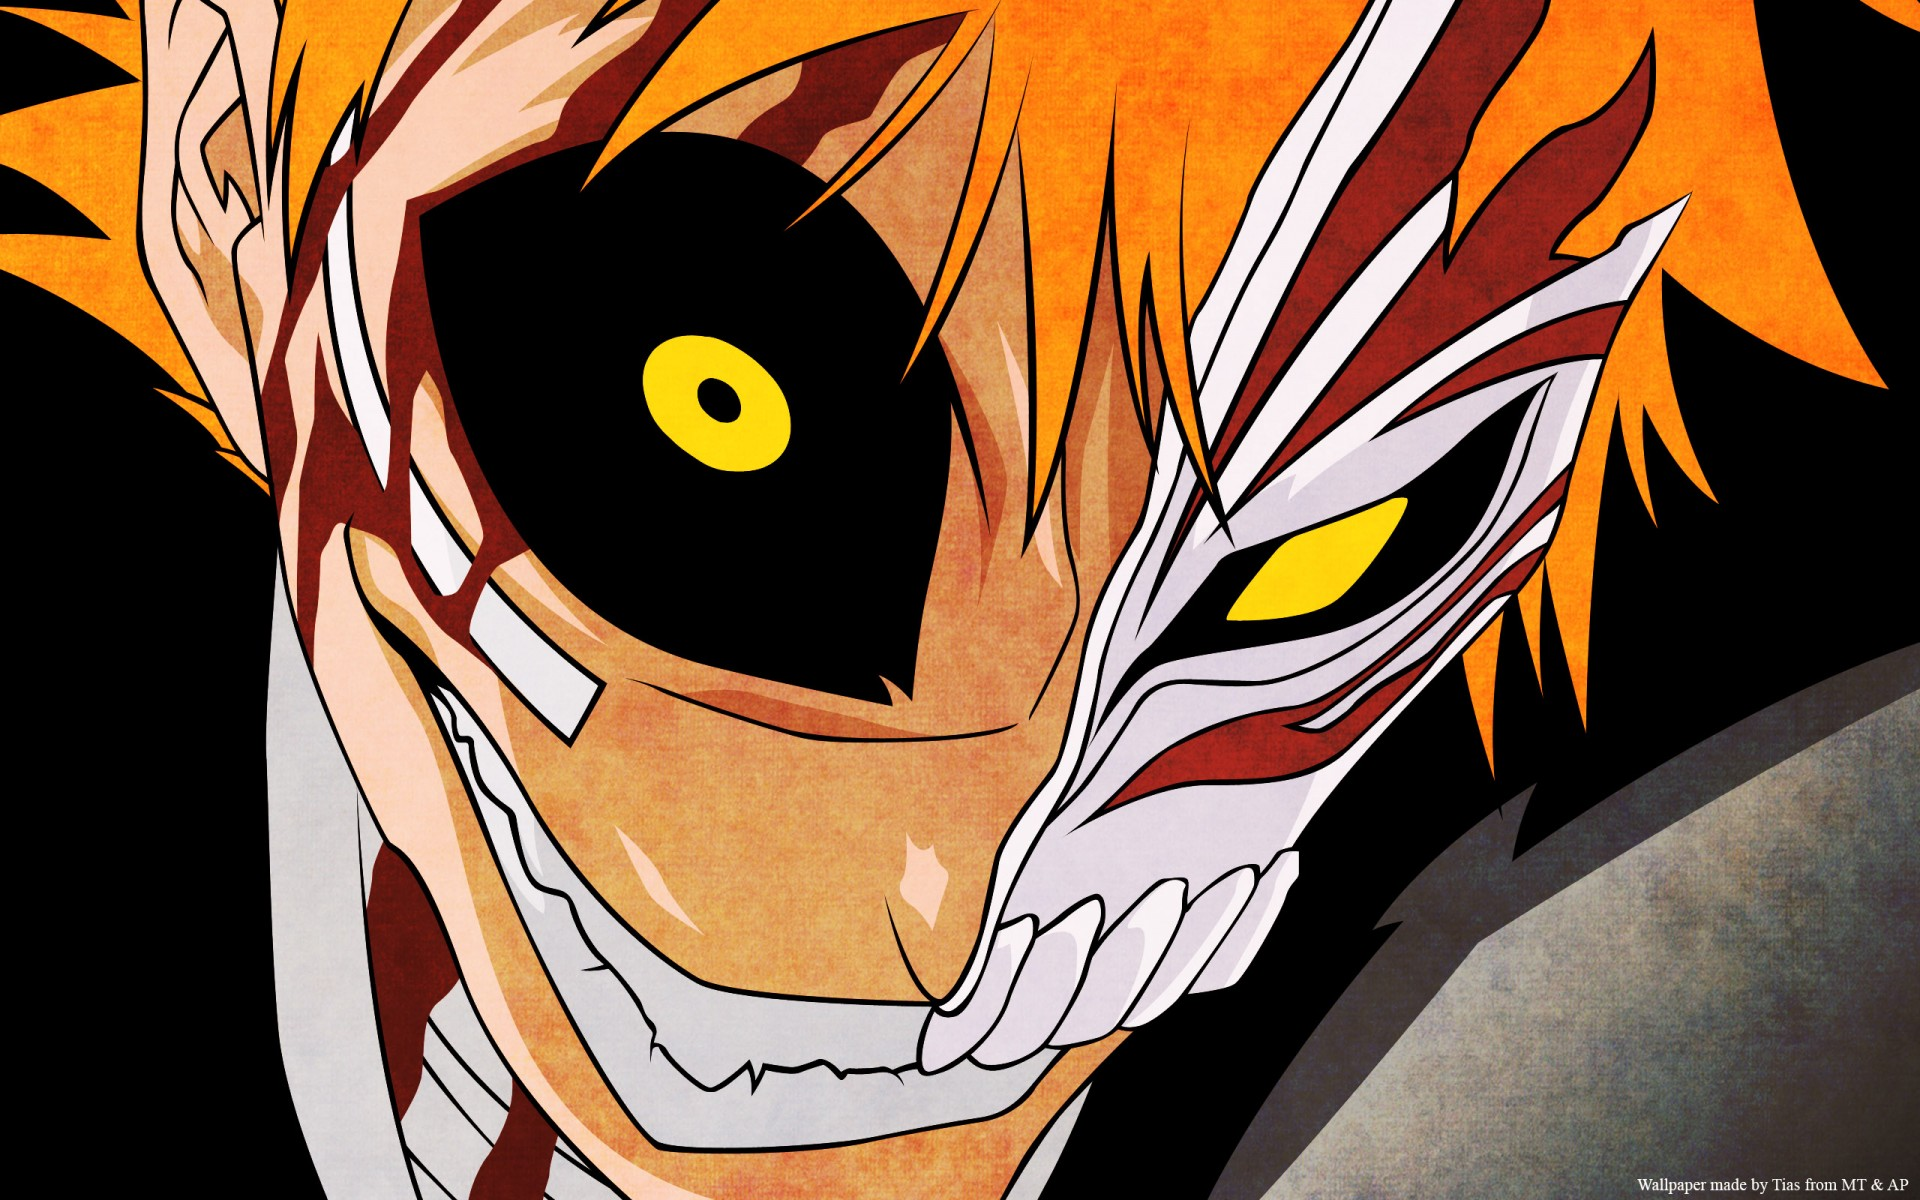 bleach manga hr wallpaper 07 imagez only